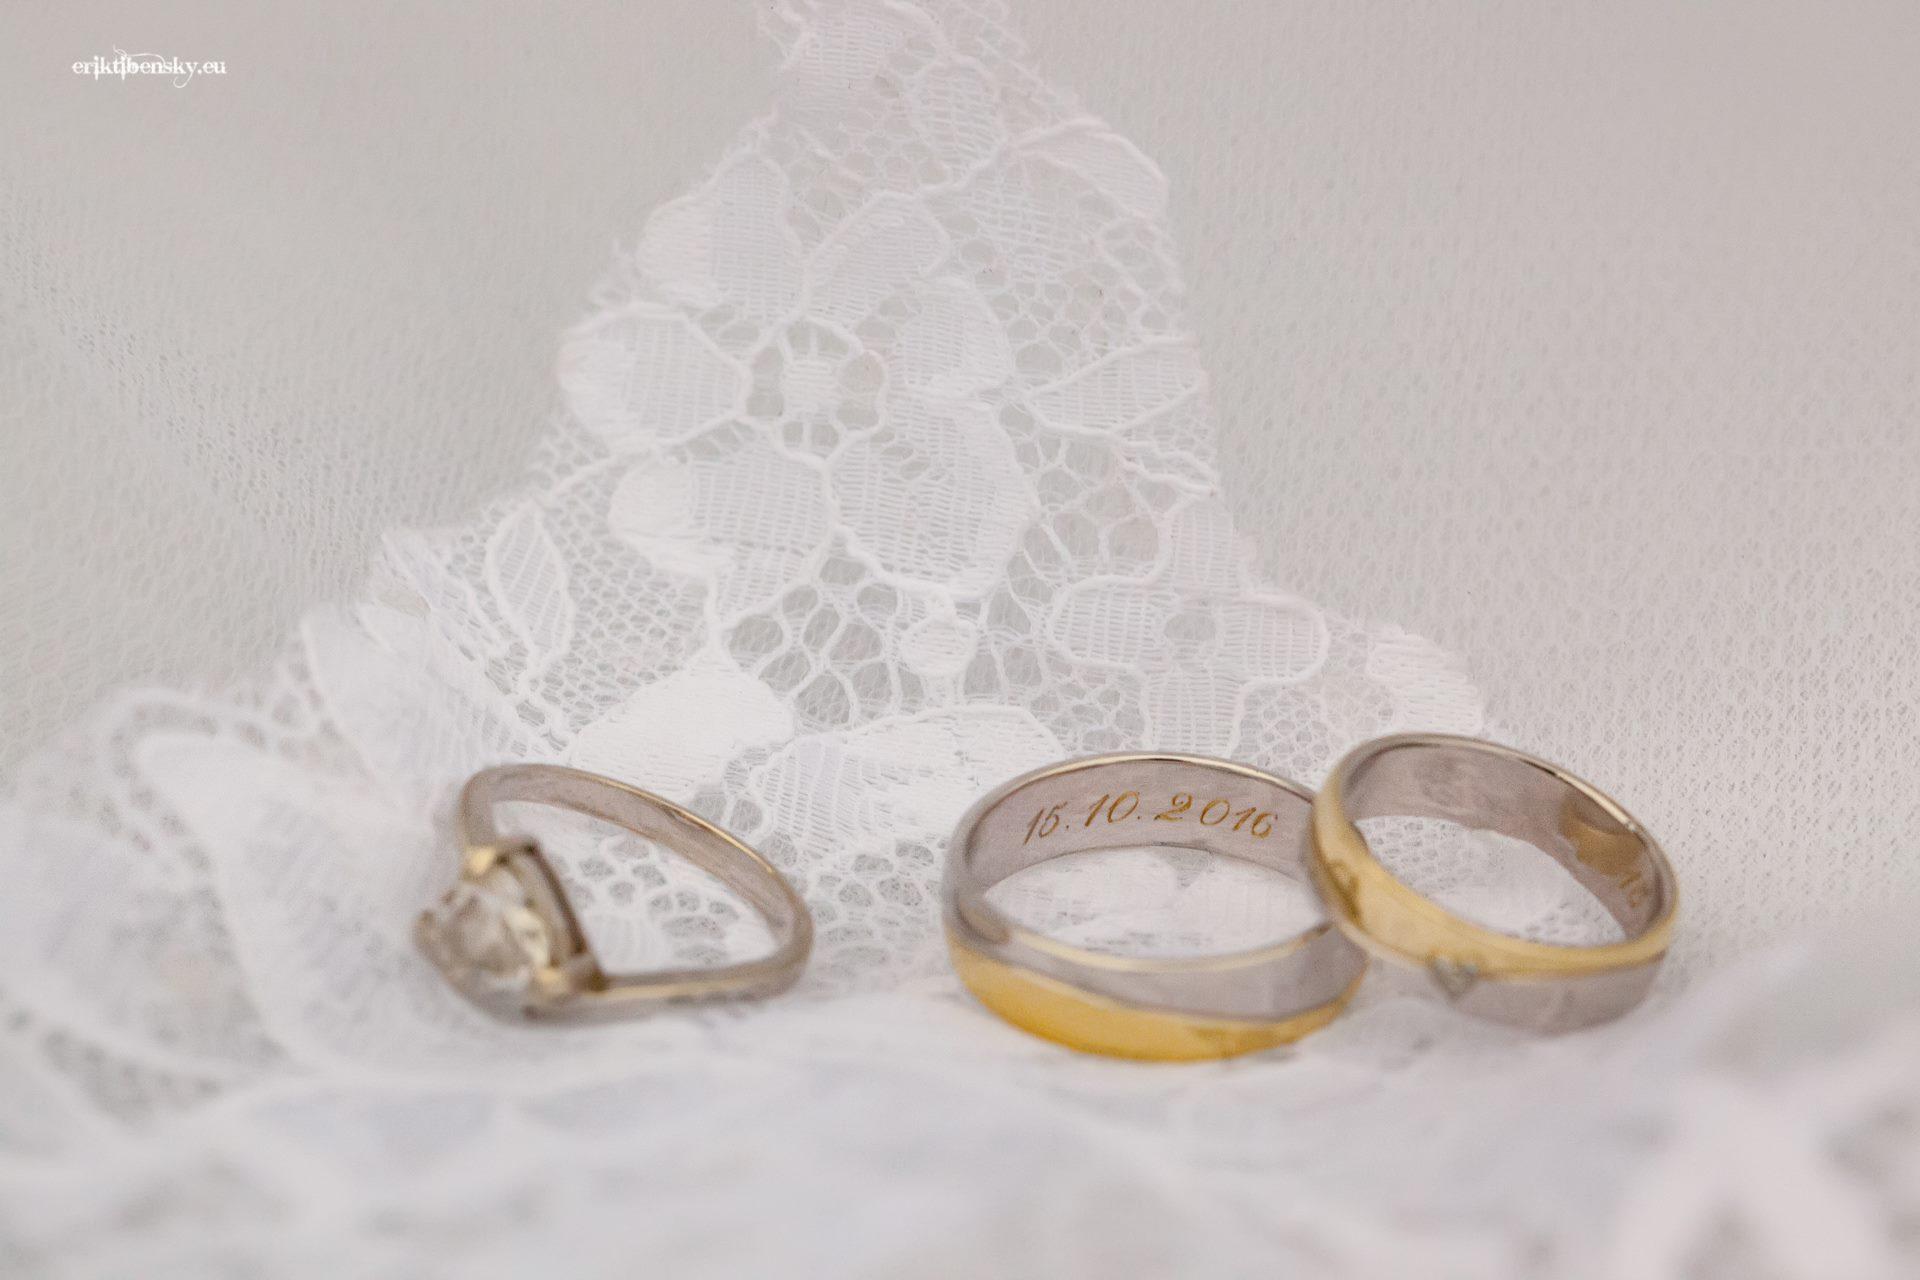 eriktibensky-eu-fotograf-wedding-photo-svadba-svadobny-pezinok-bratislava-modra-senec-1004